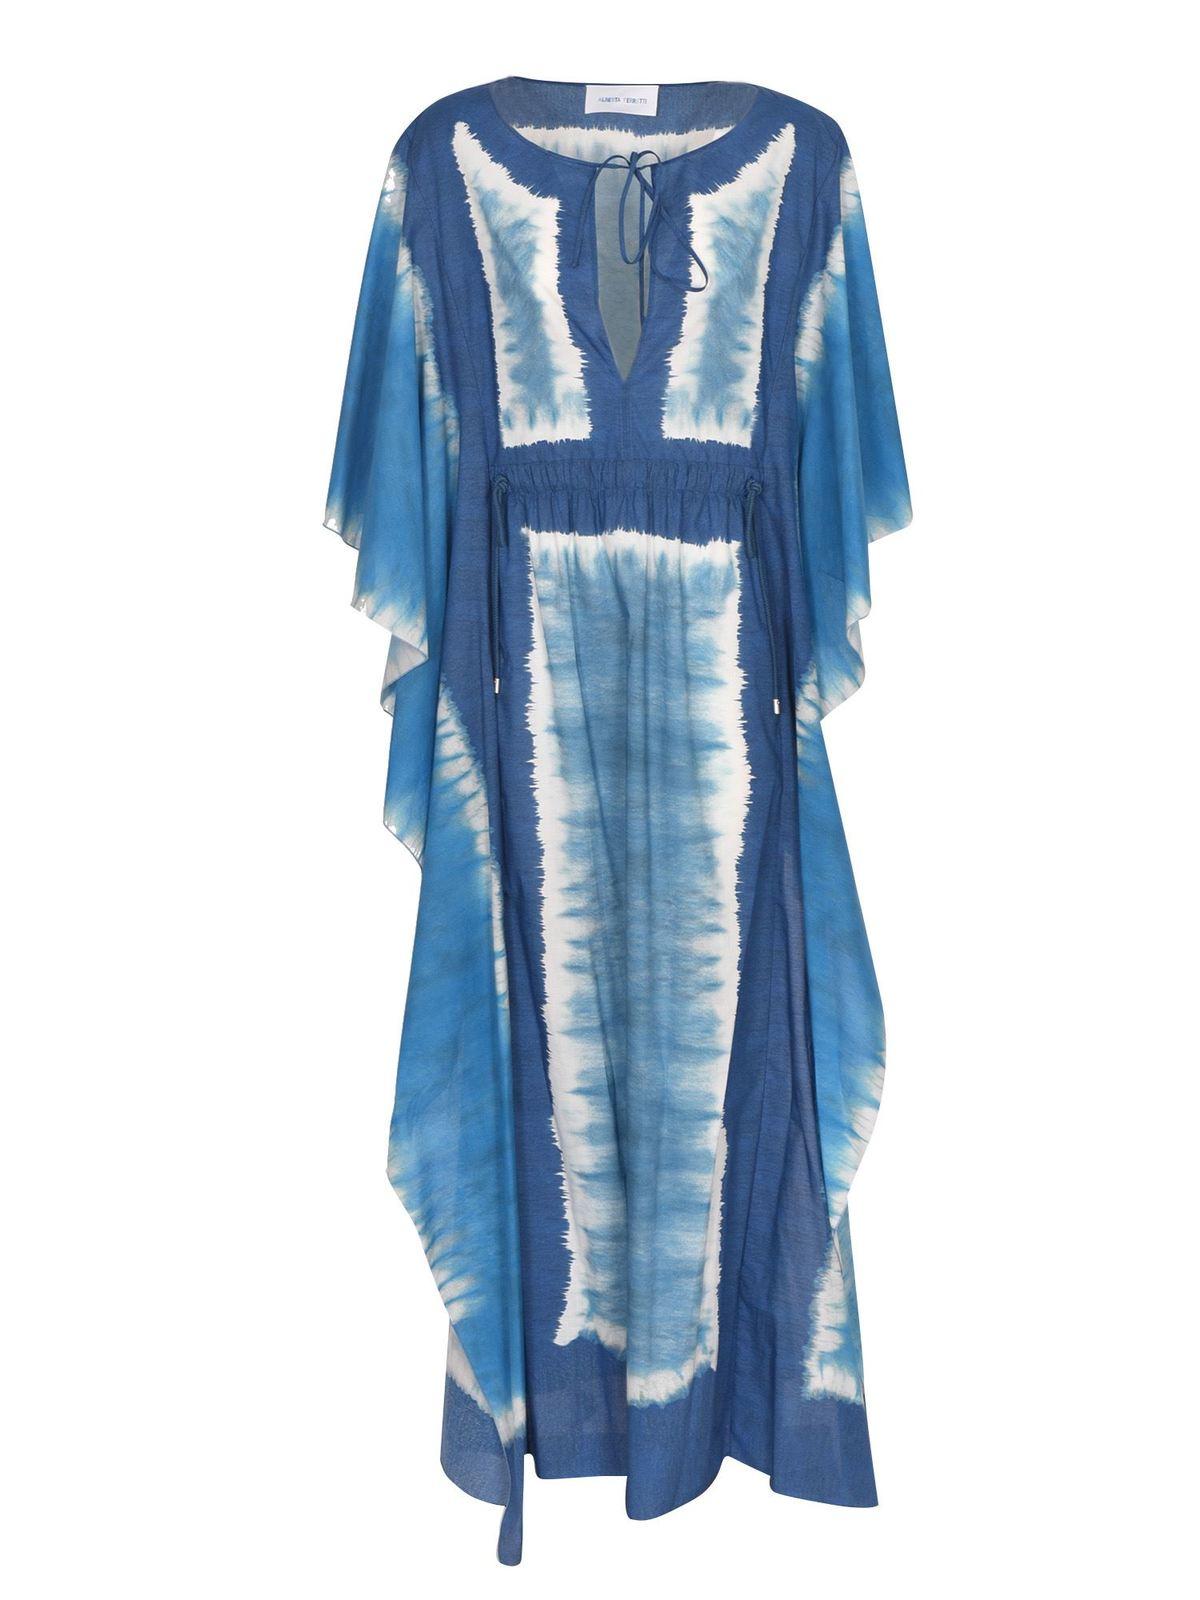 Alberta Ferretti TIE DYE TUNIC IN BLUE AND LIGHT BLUE